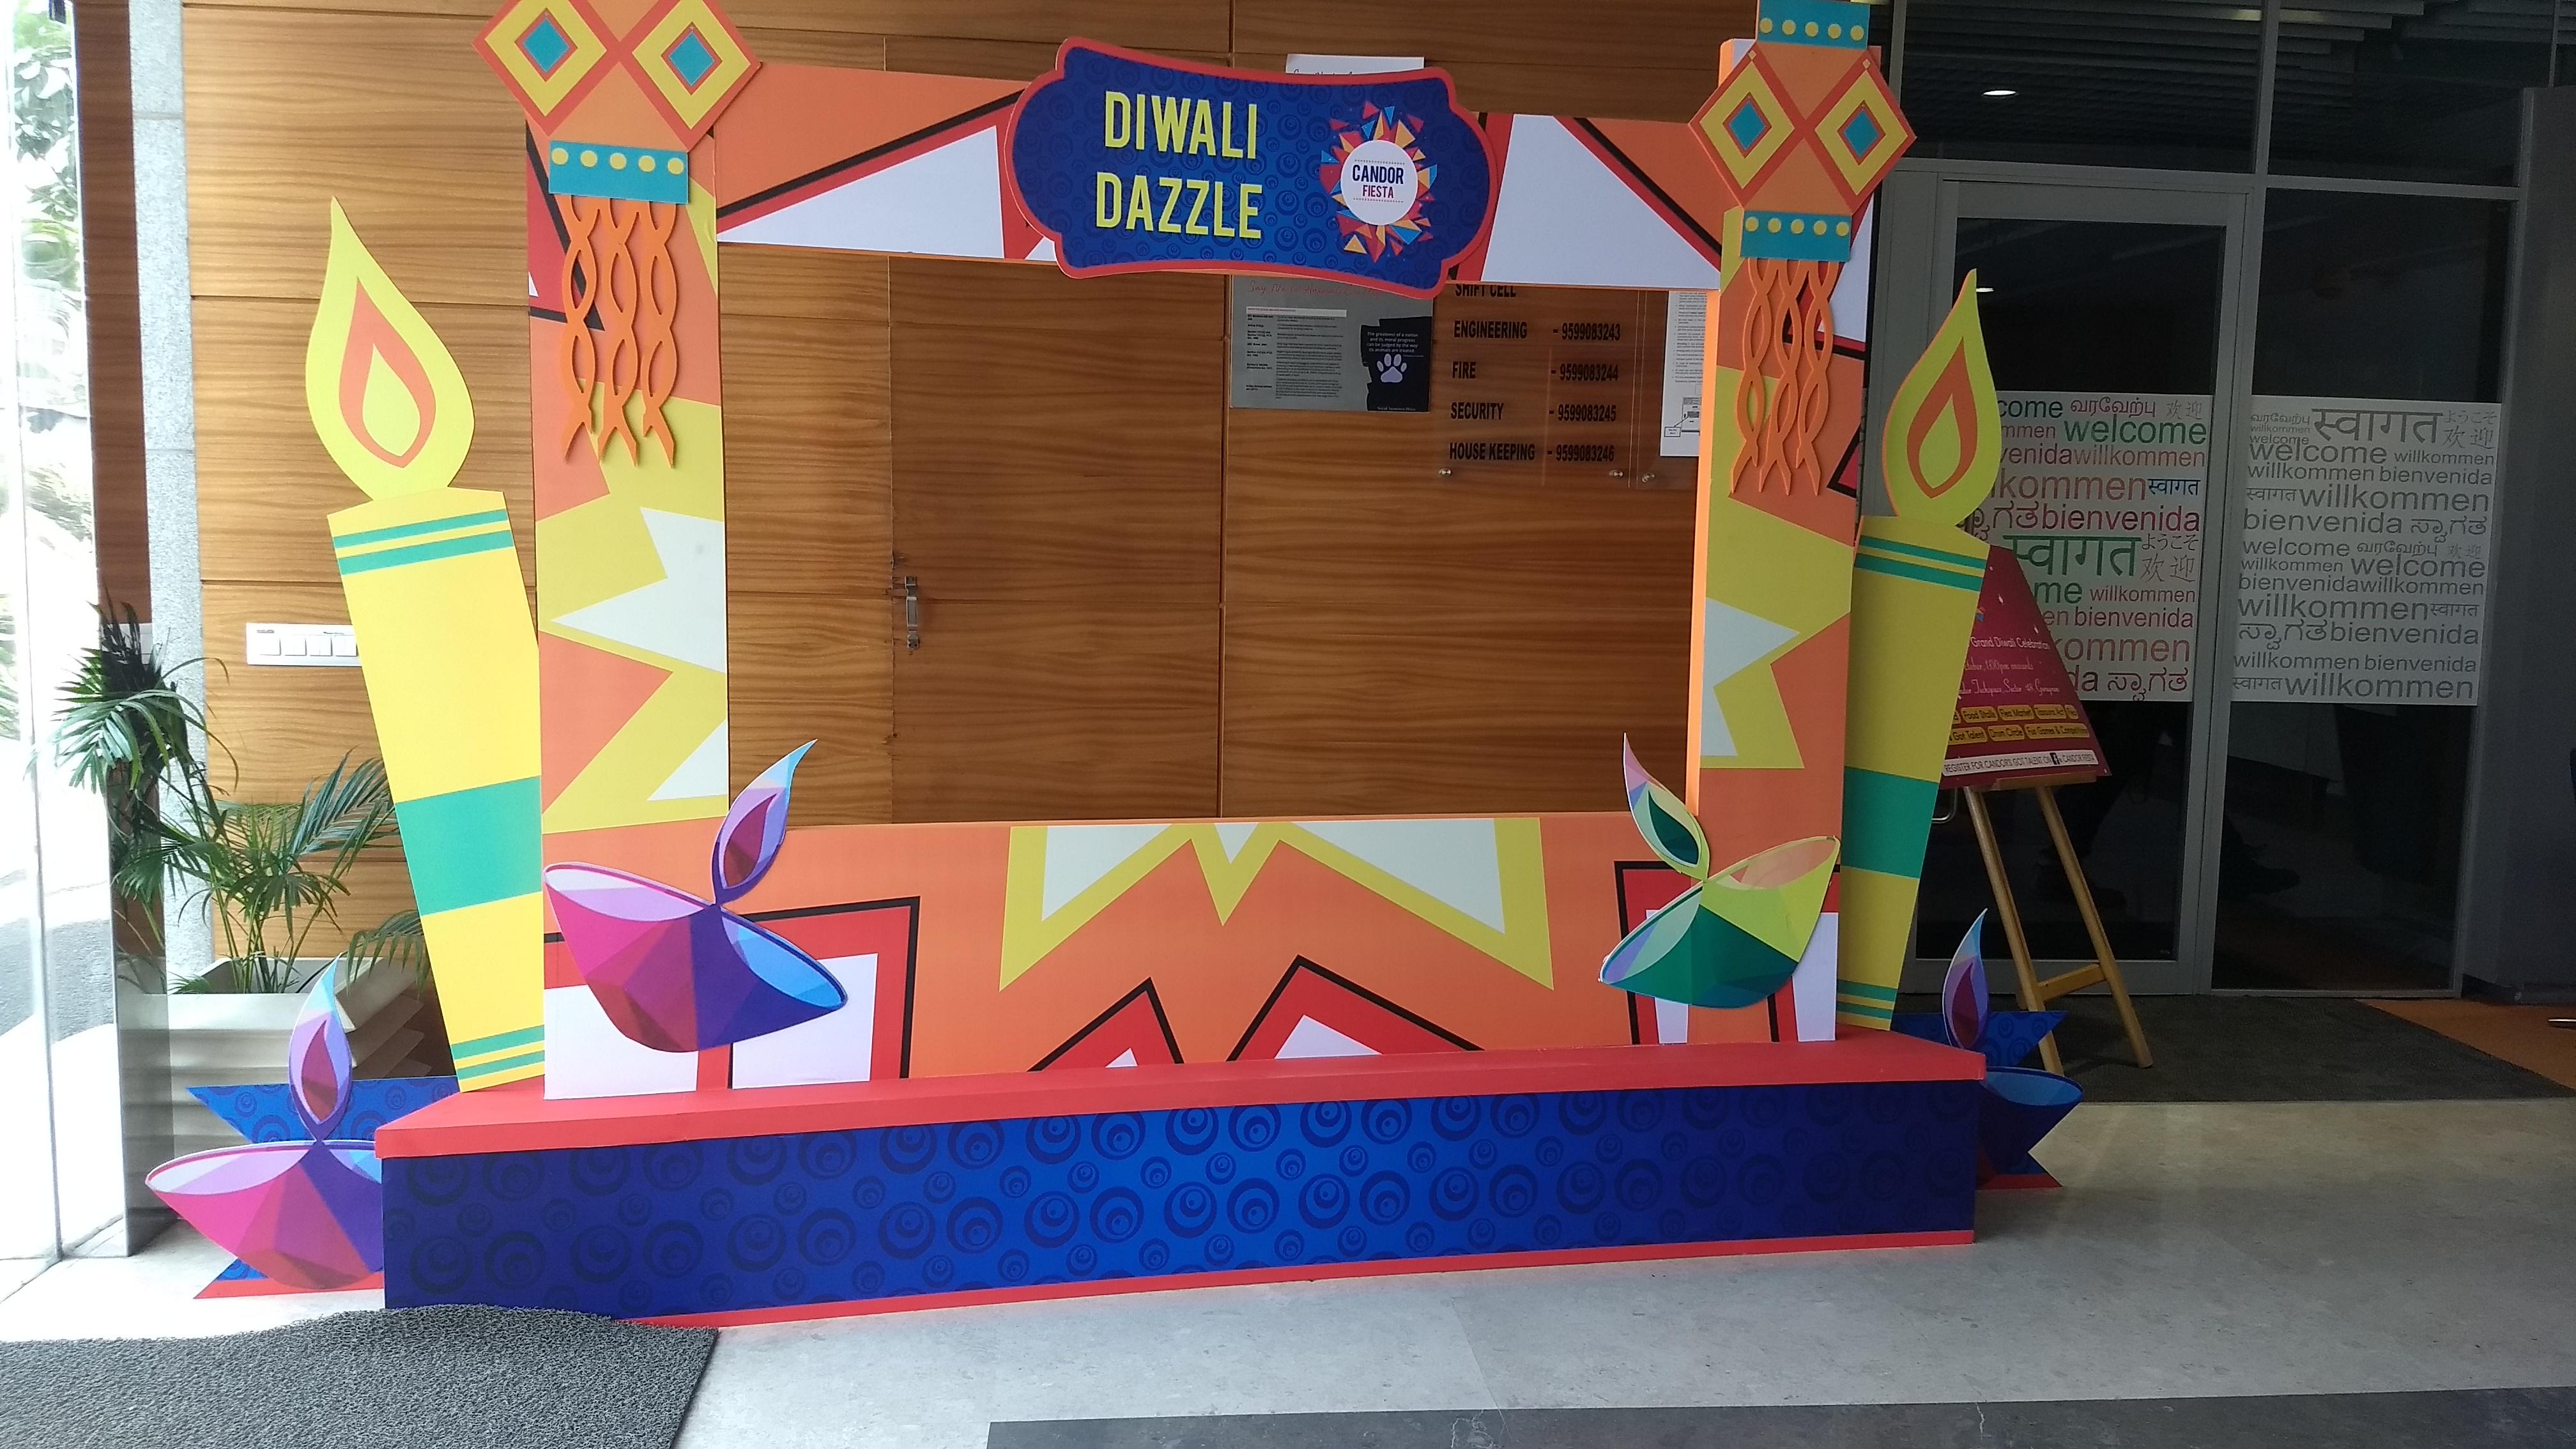 candor-diwali-Gurgaon-48-10.jpg